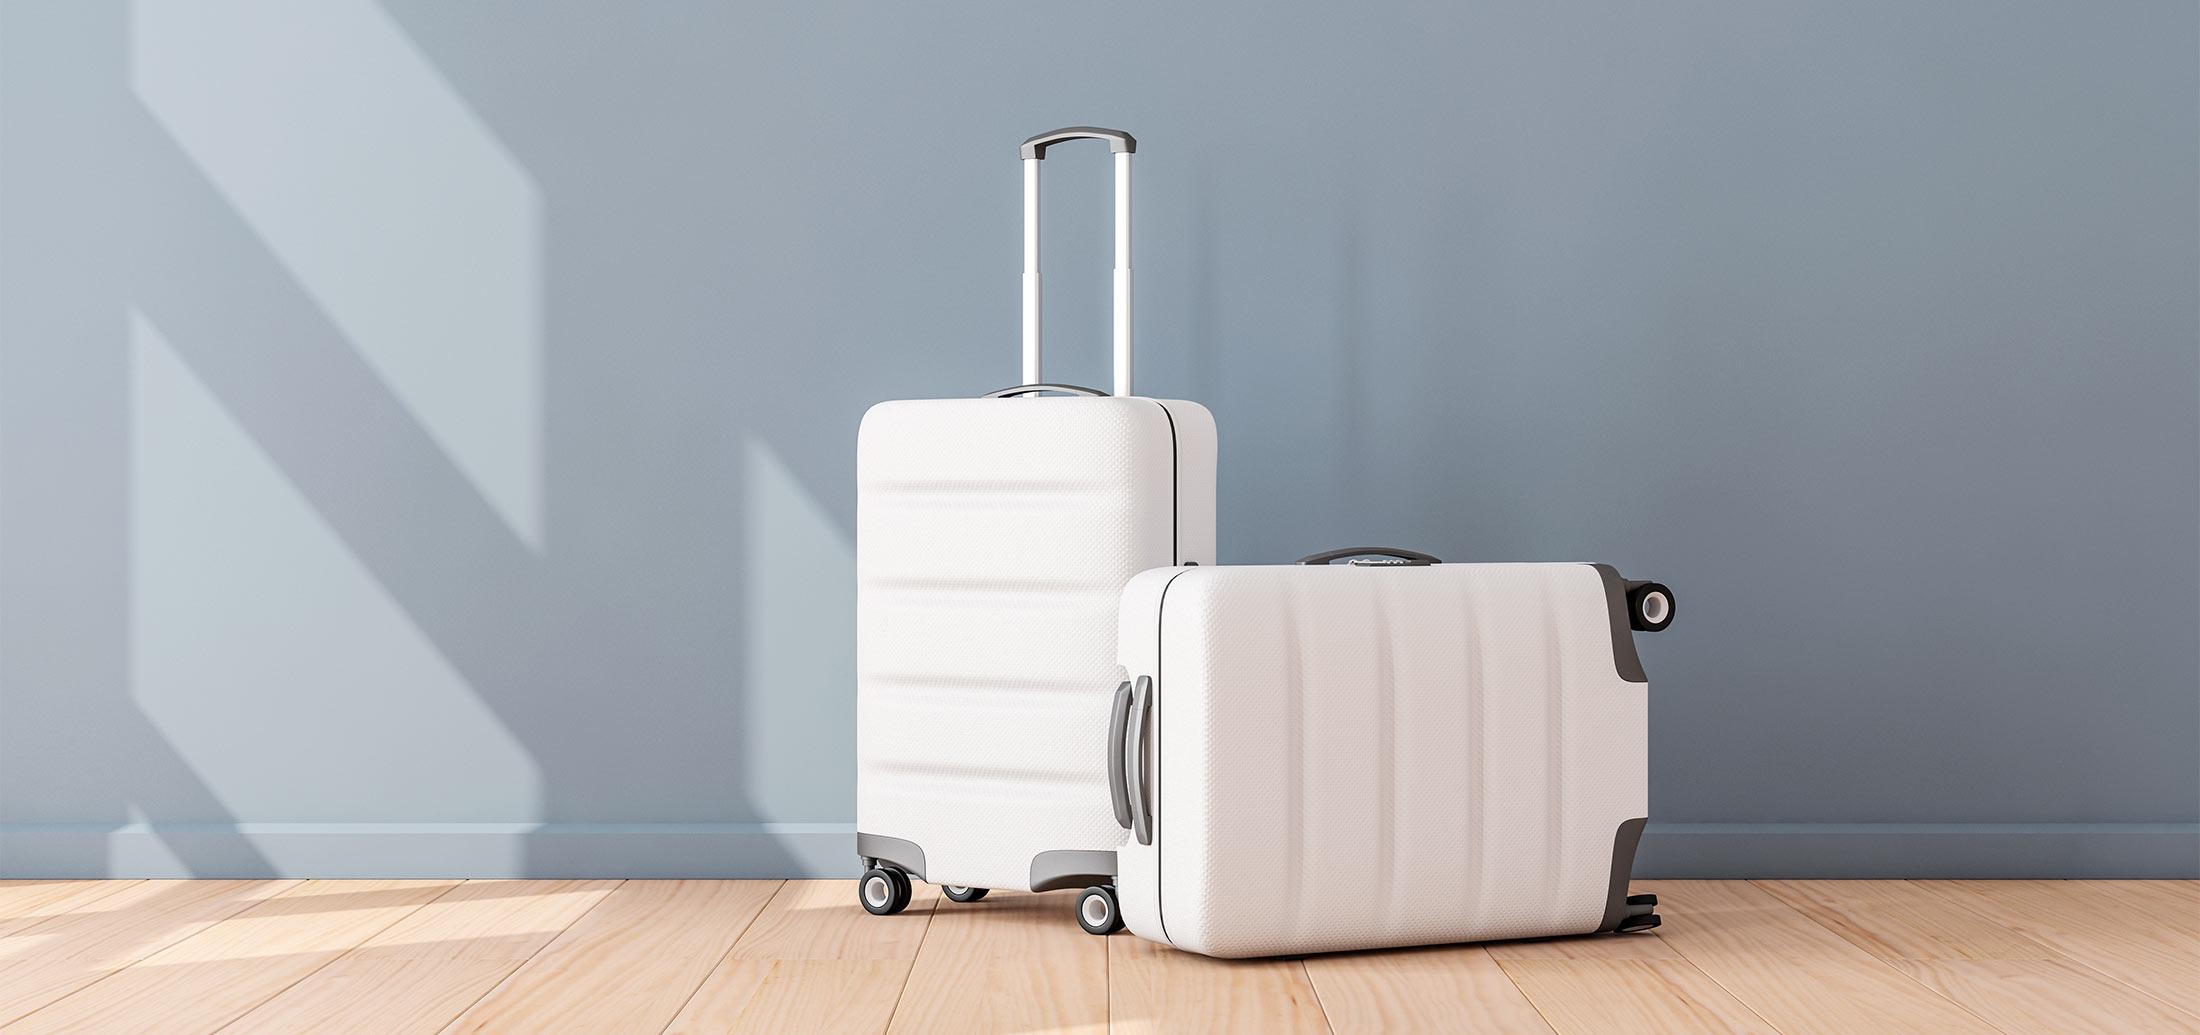 ind_full_luggage